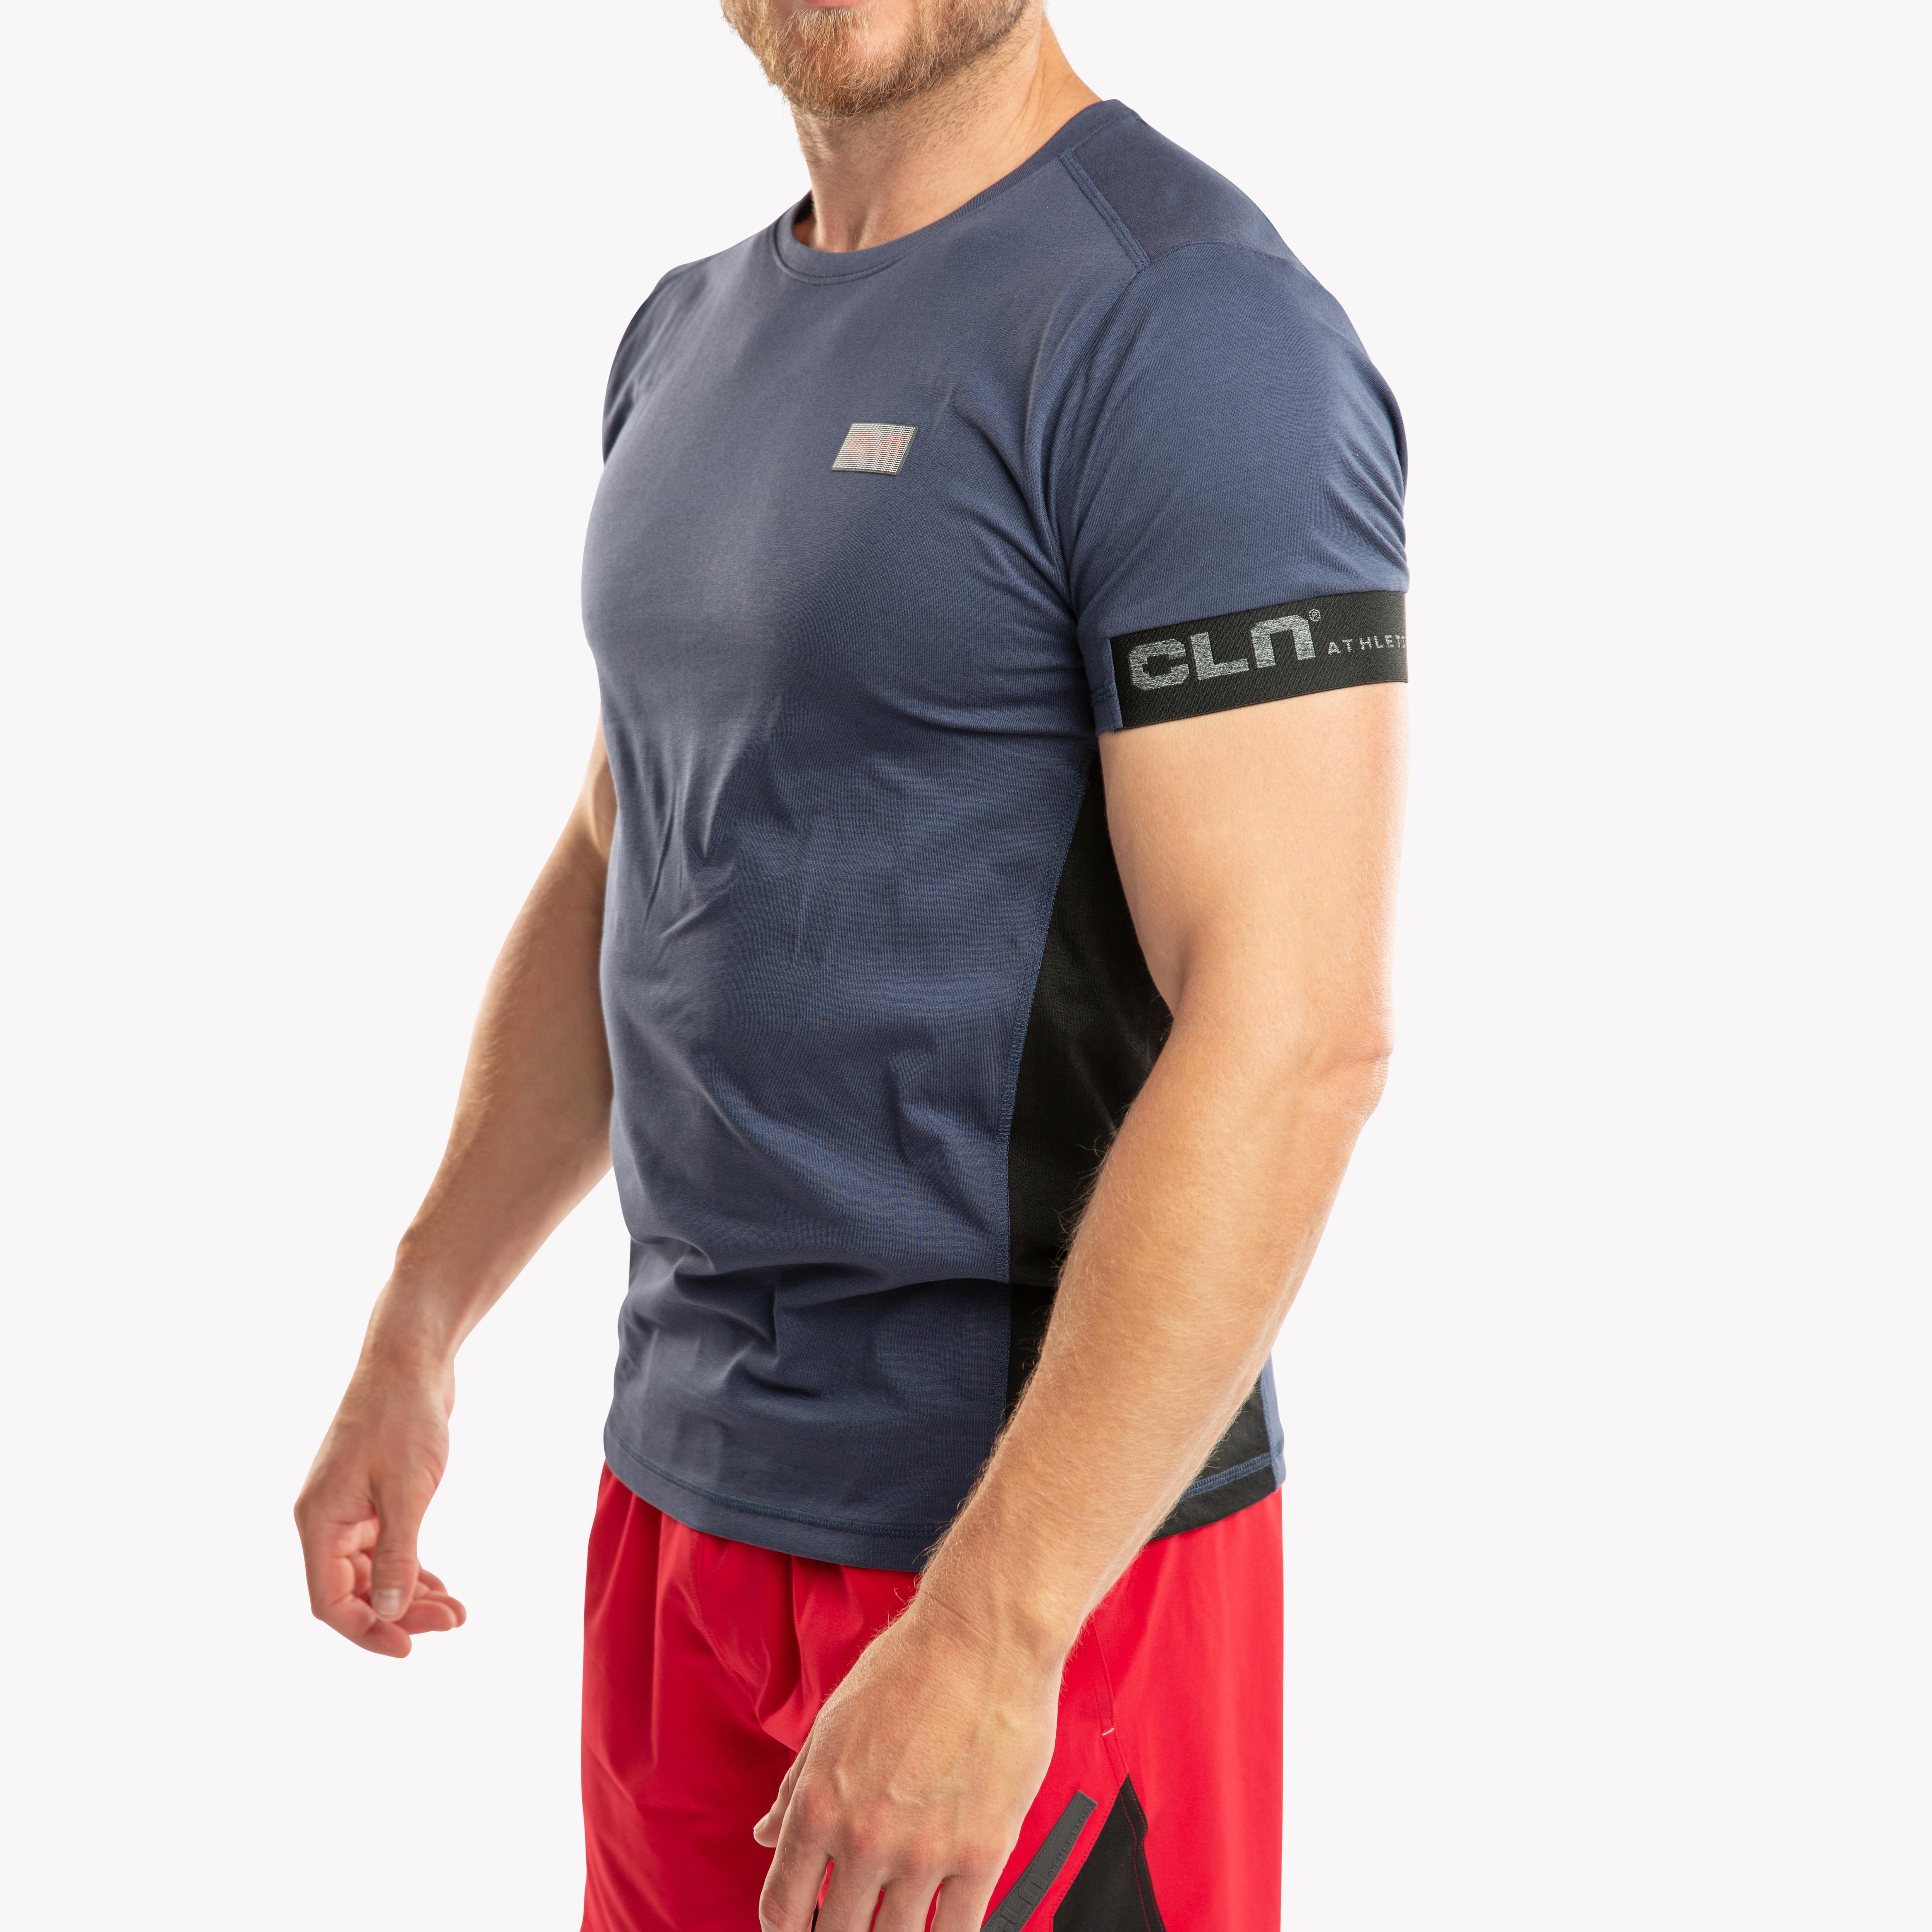 CLN Crustis t-shirt Indigo blue